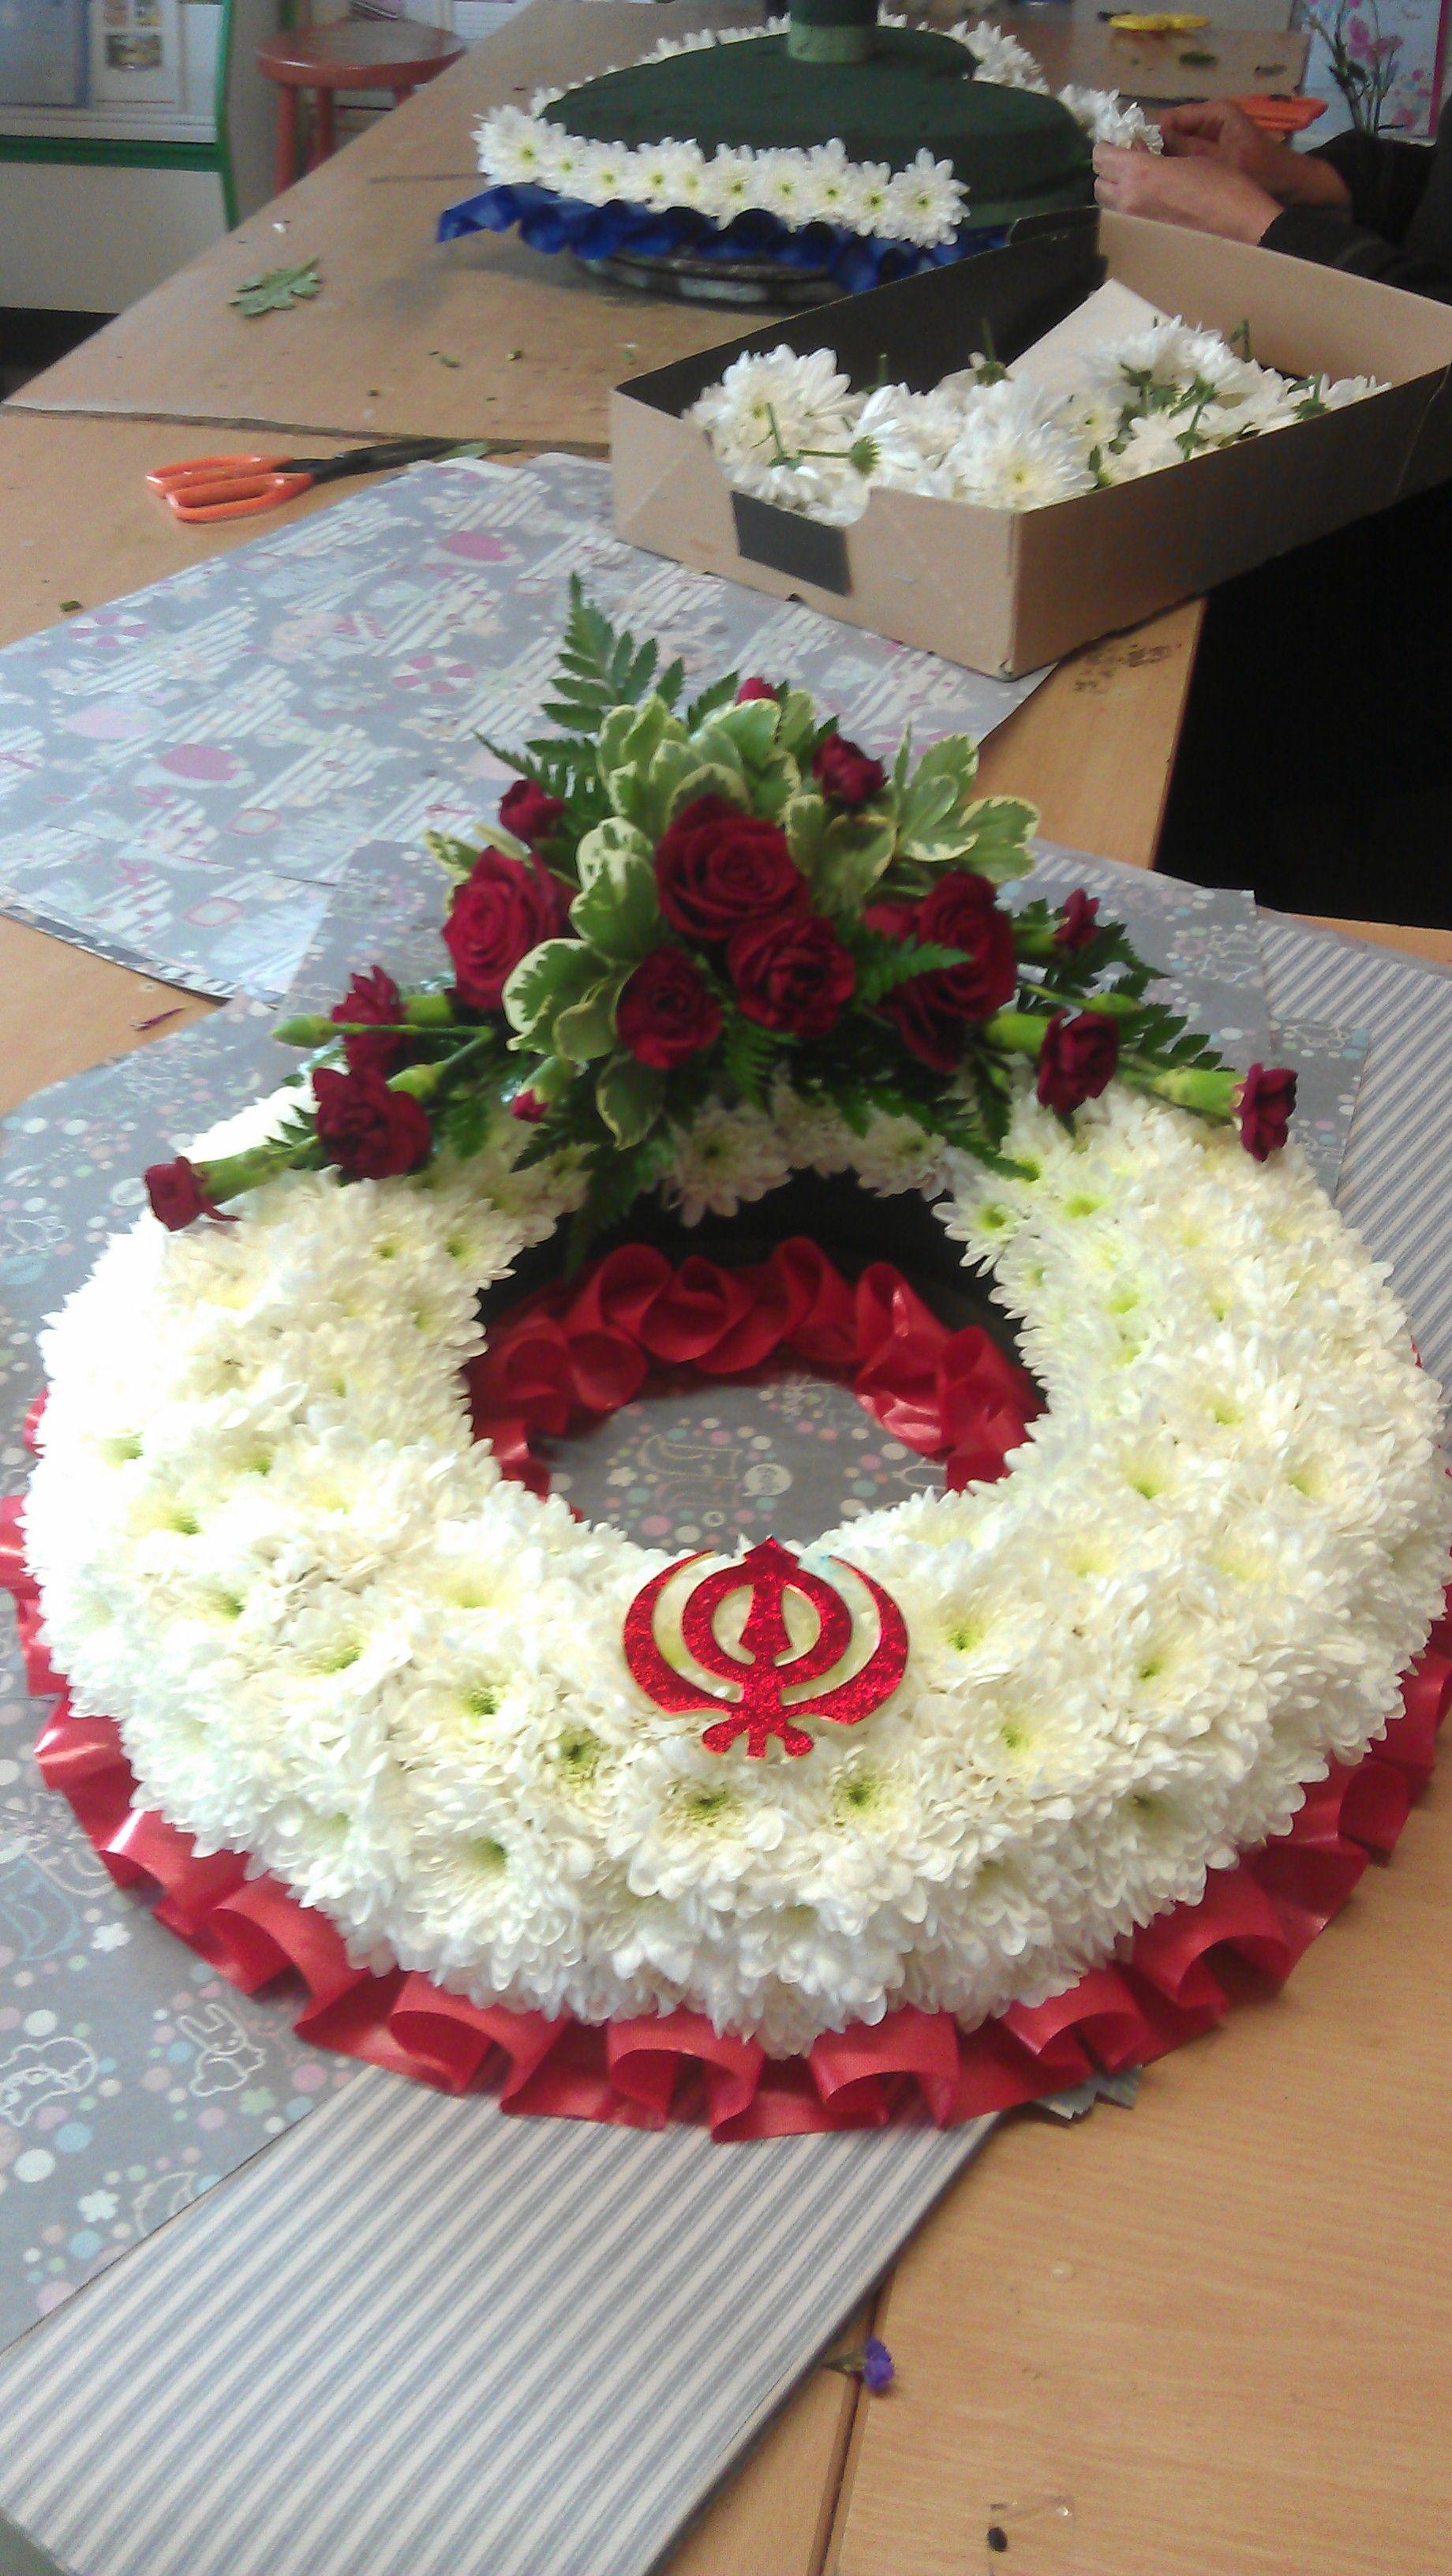 Khanda sikh symbol added on funeral tribute funeral tributes khanda sikh symbol added on funeral tribute izmirmasajfo Choice Image